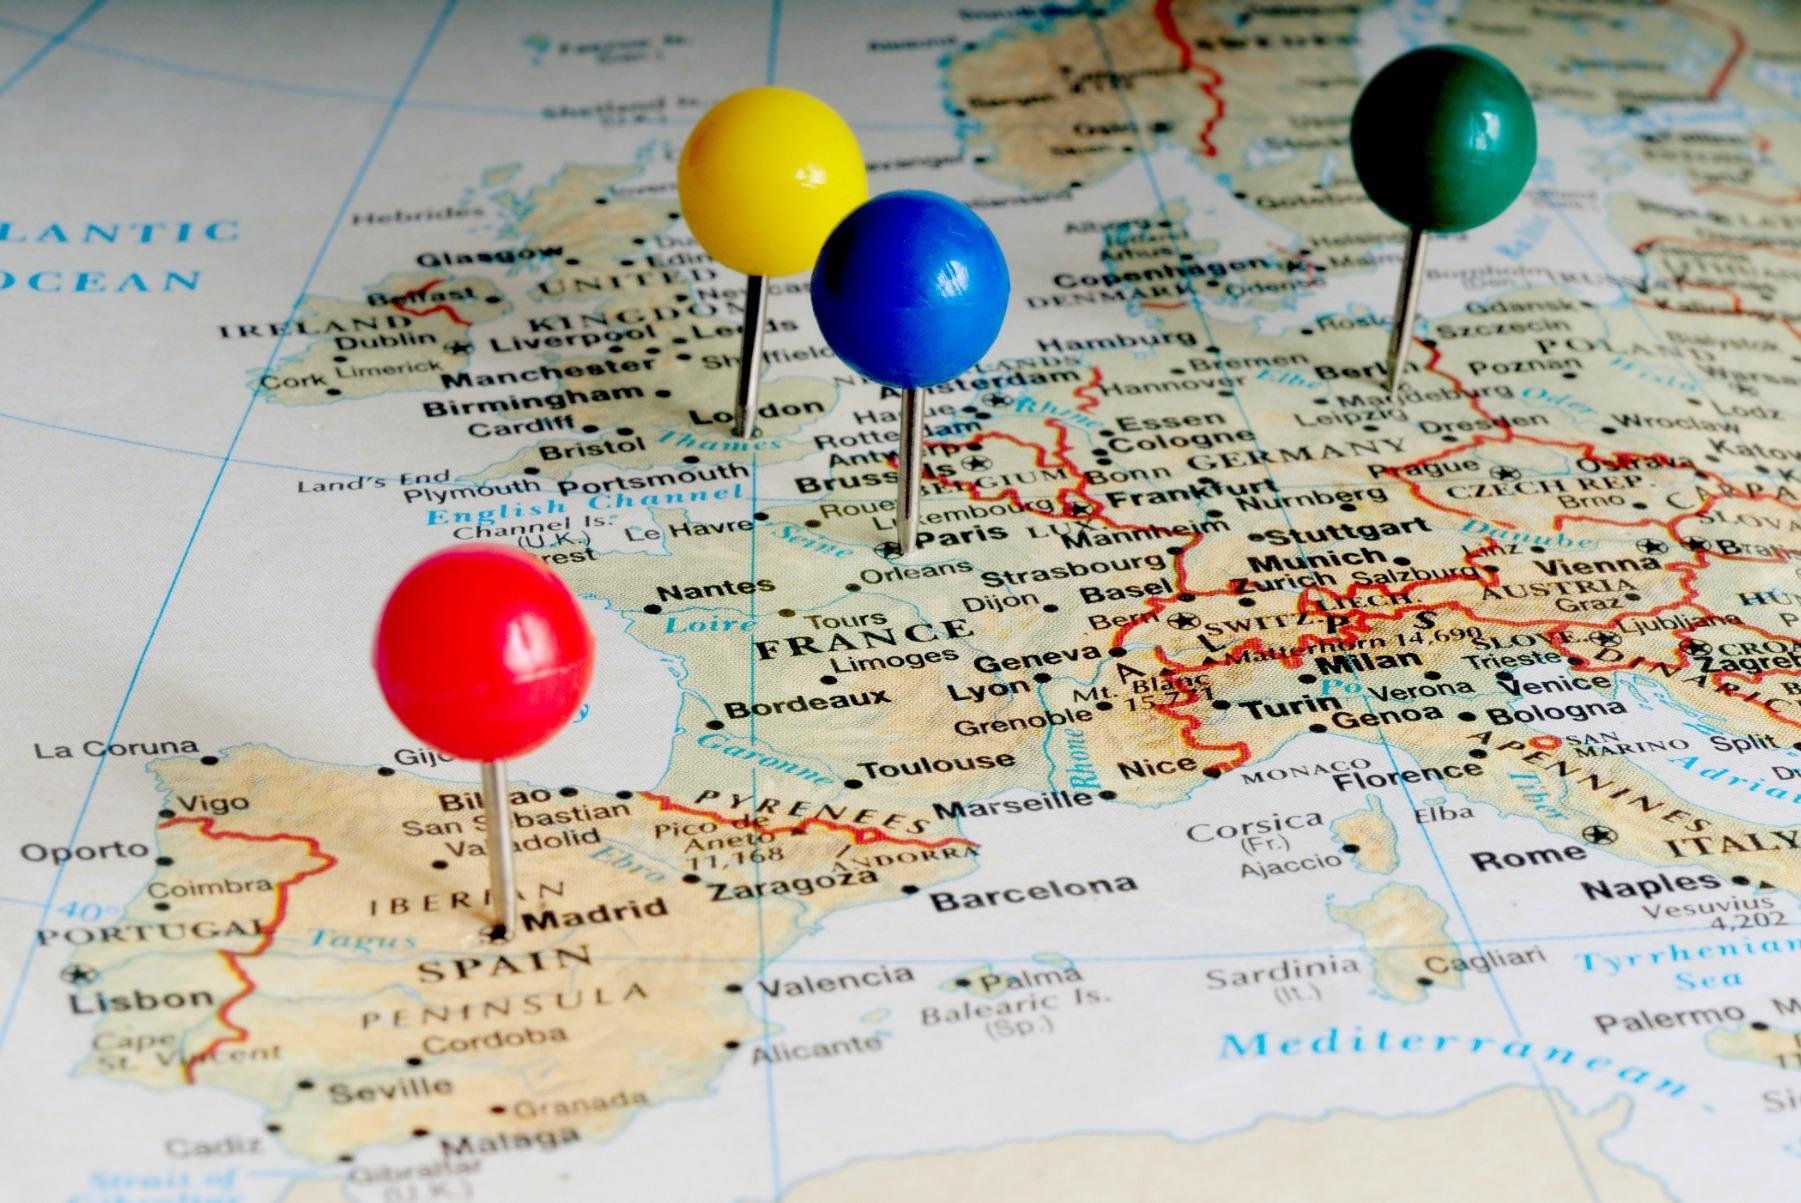 Europe [Gualberto Becerra/Shutterstock]